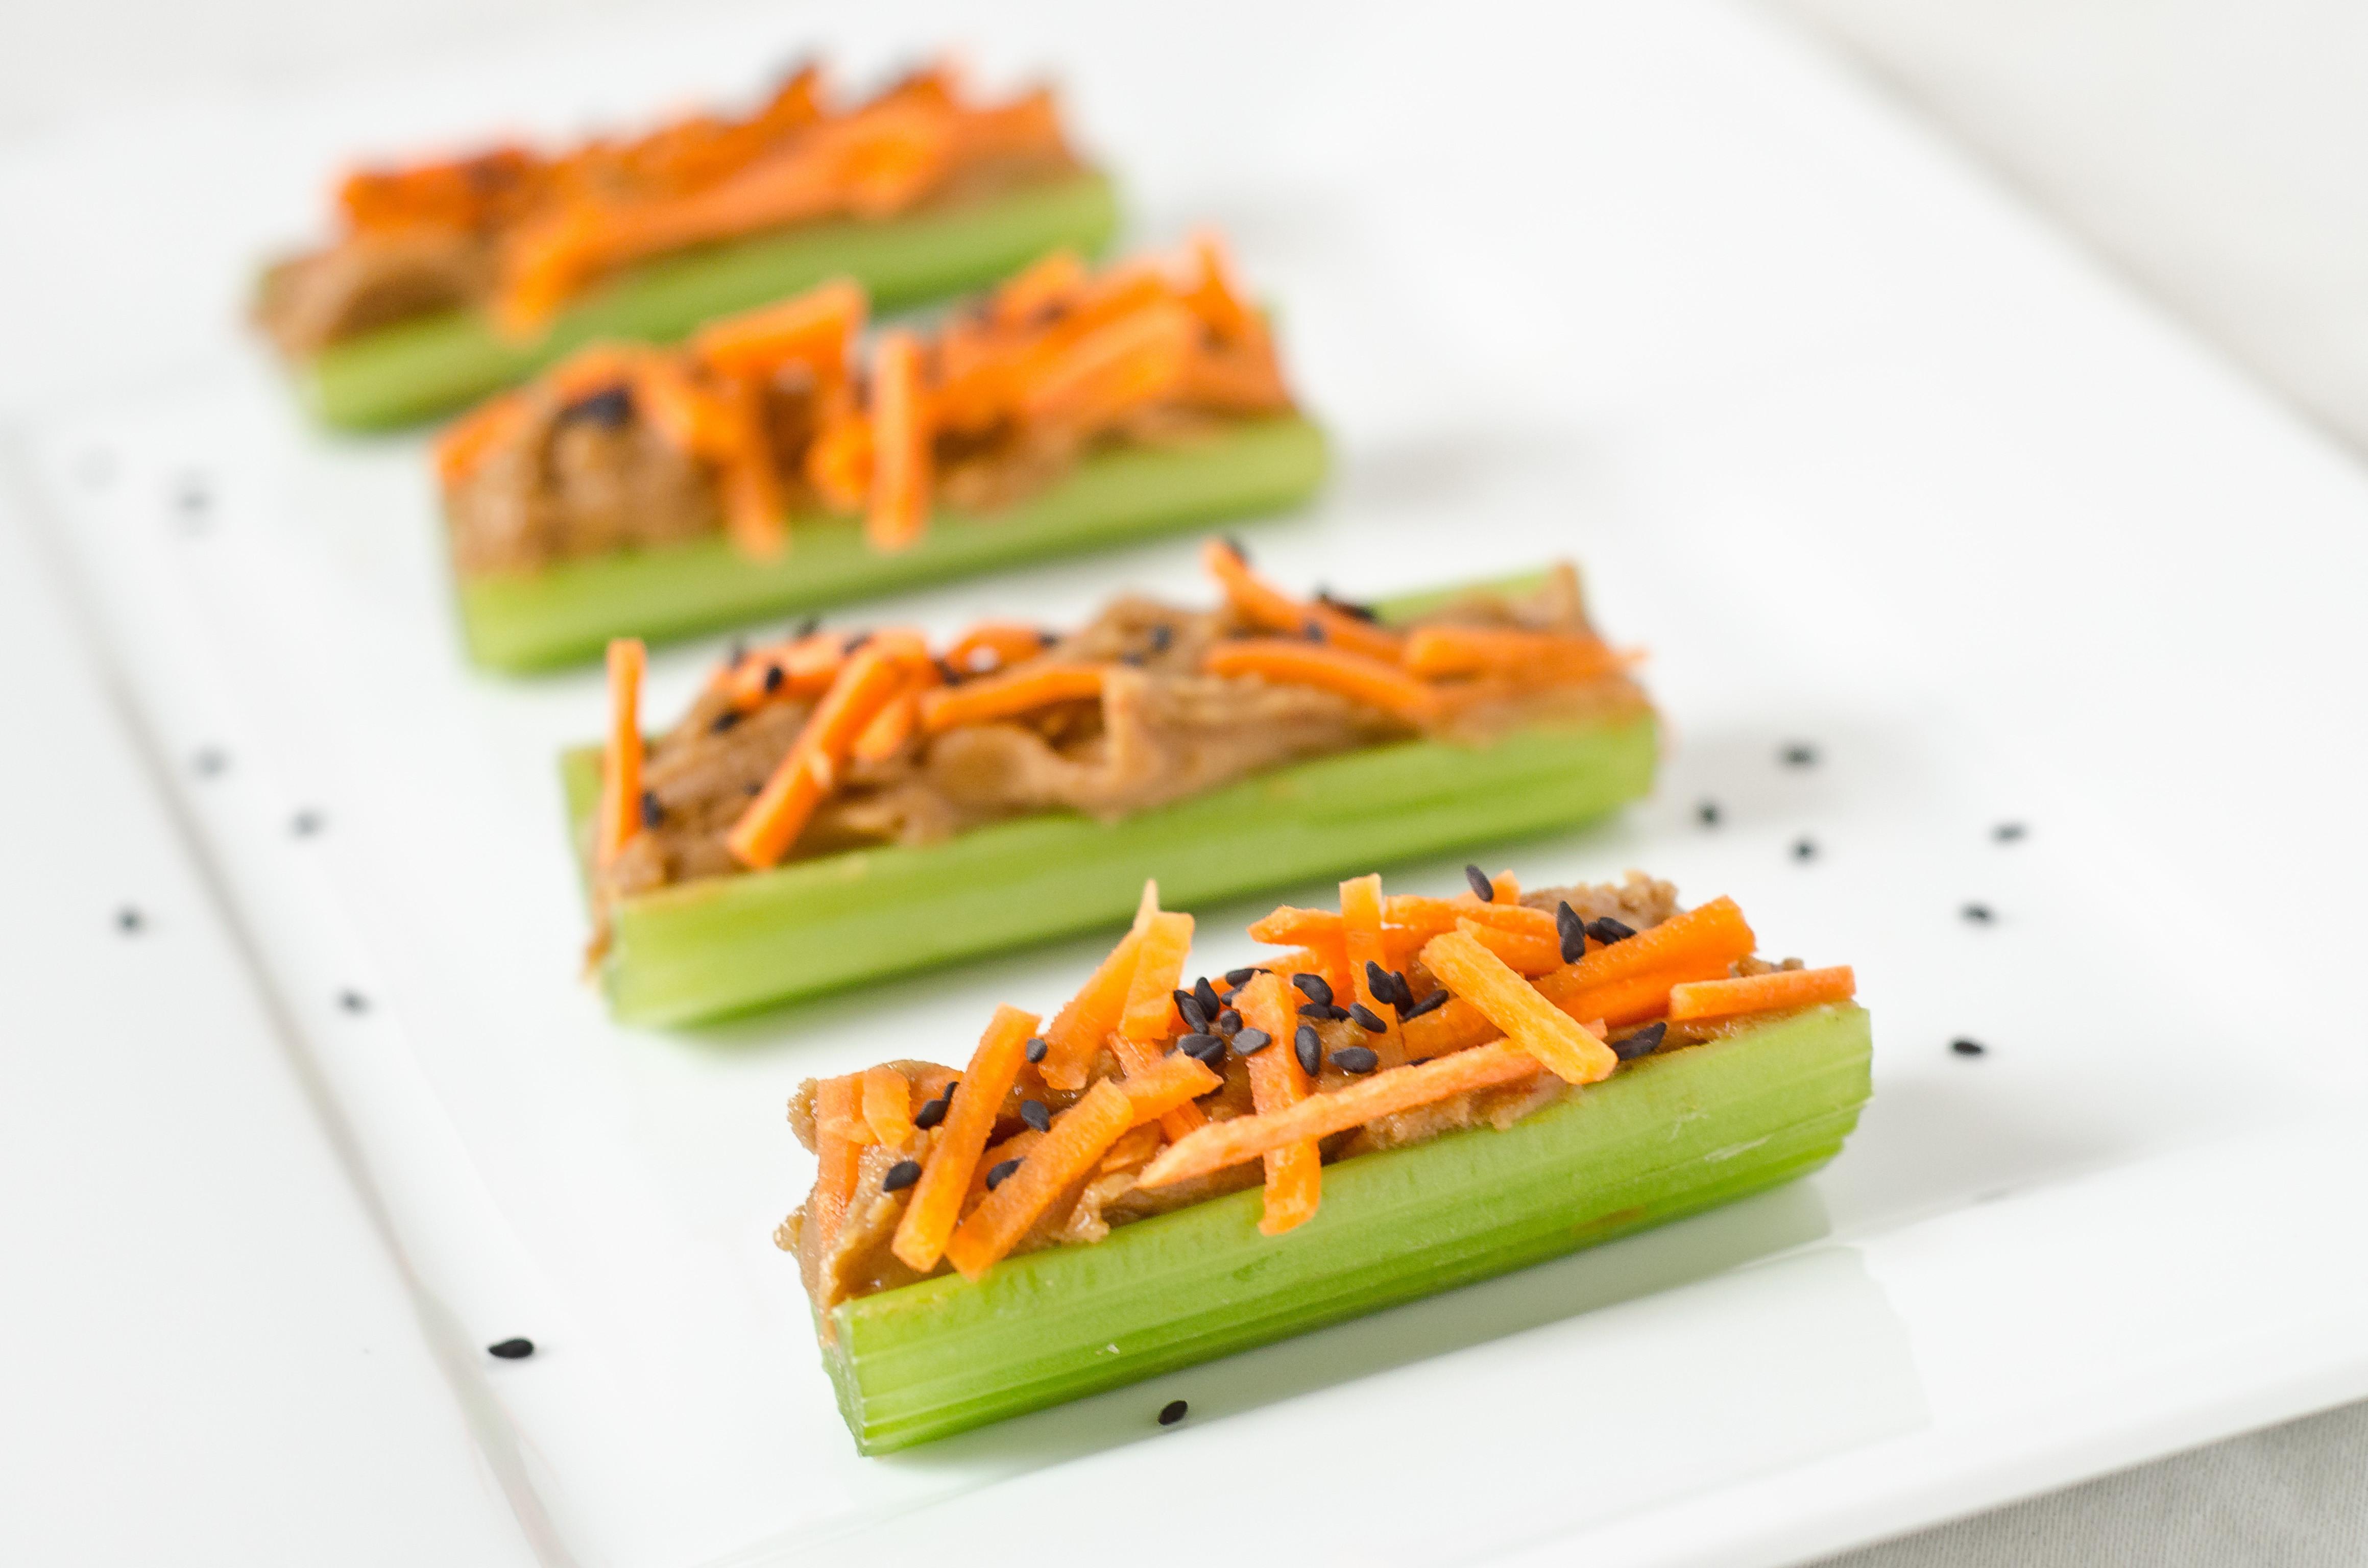 Healthy Vegetarian Snacks  65 Healthy Ve arian Snack Ideas The Fig Tree